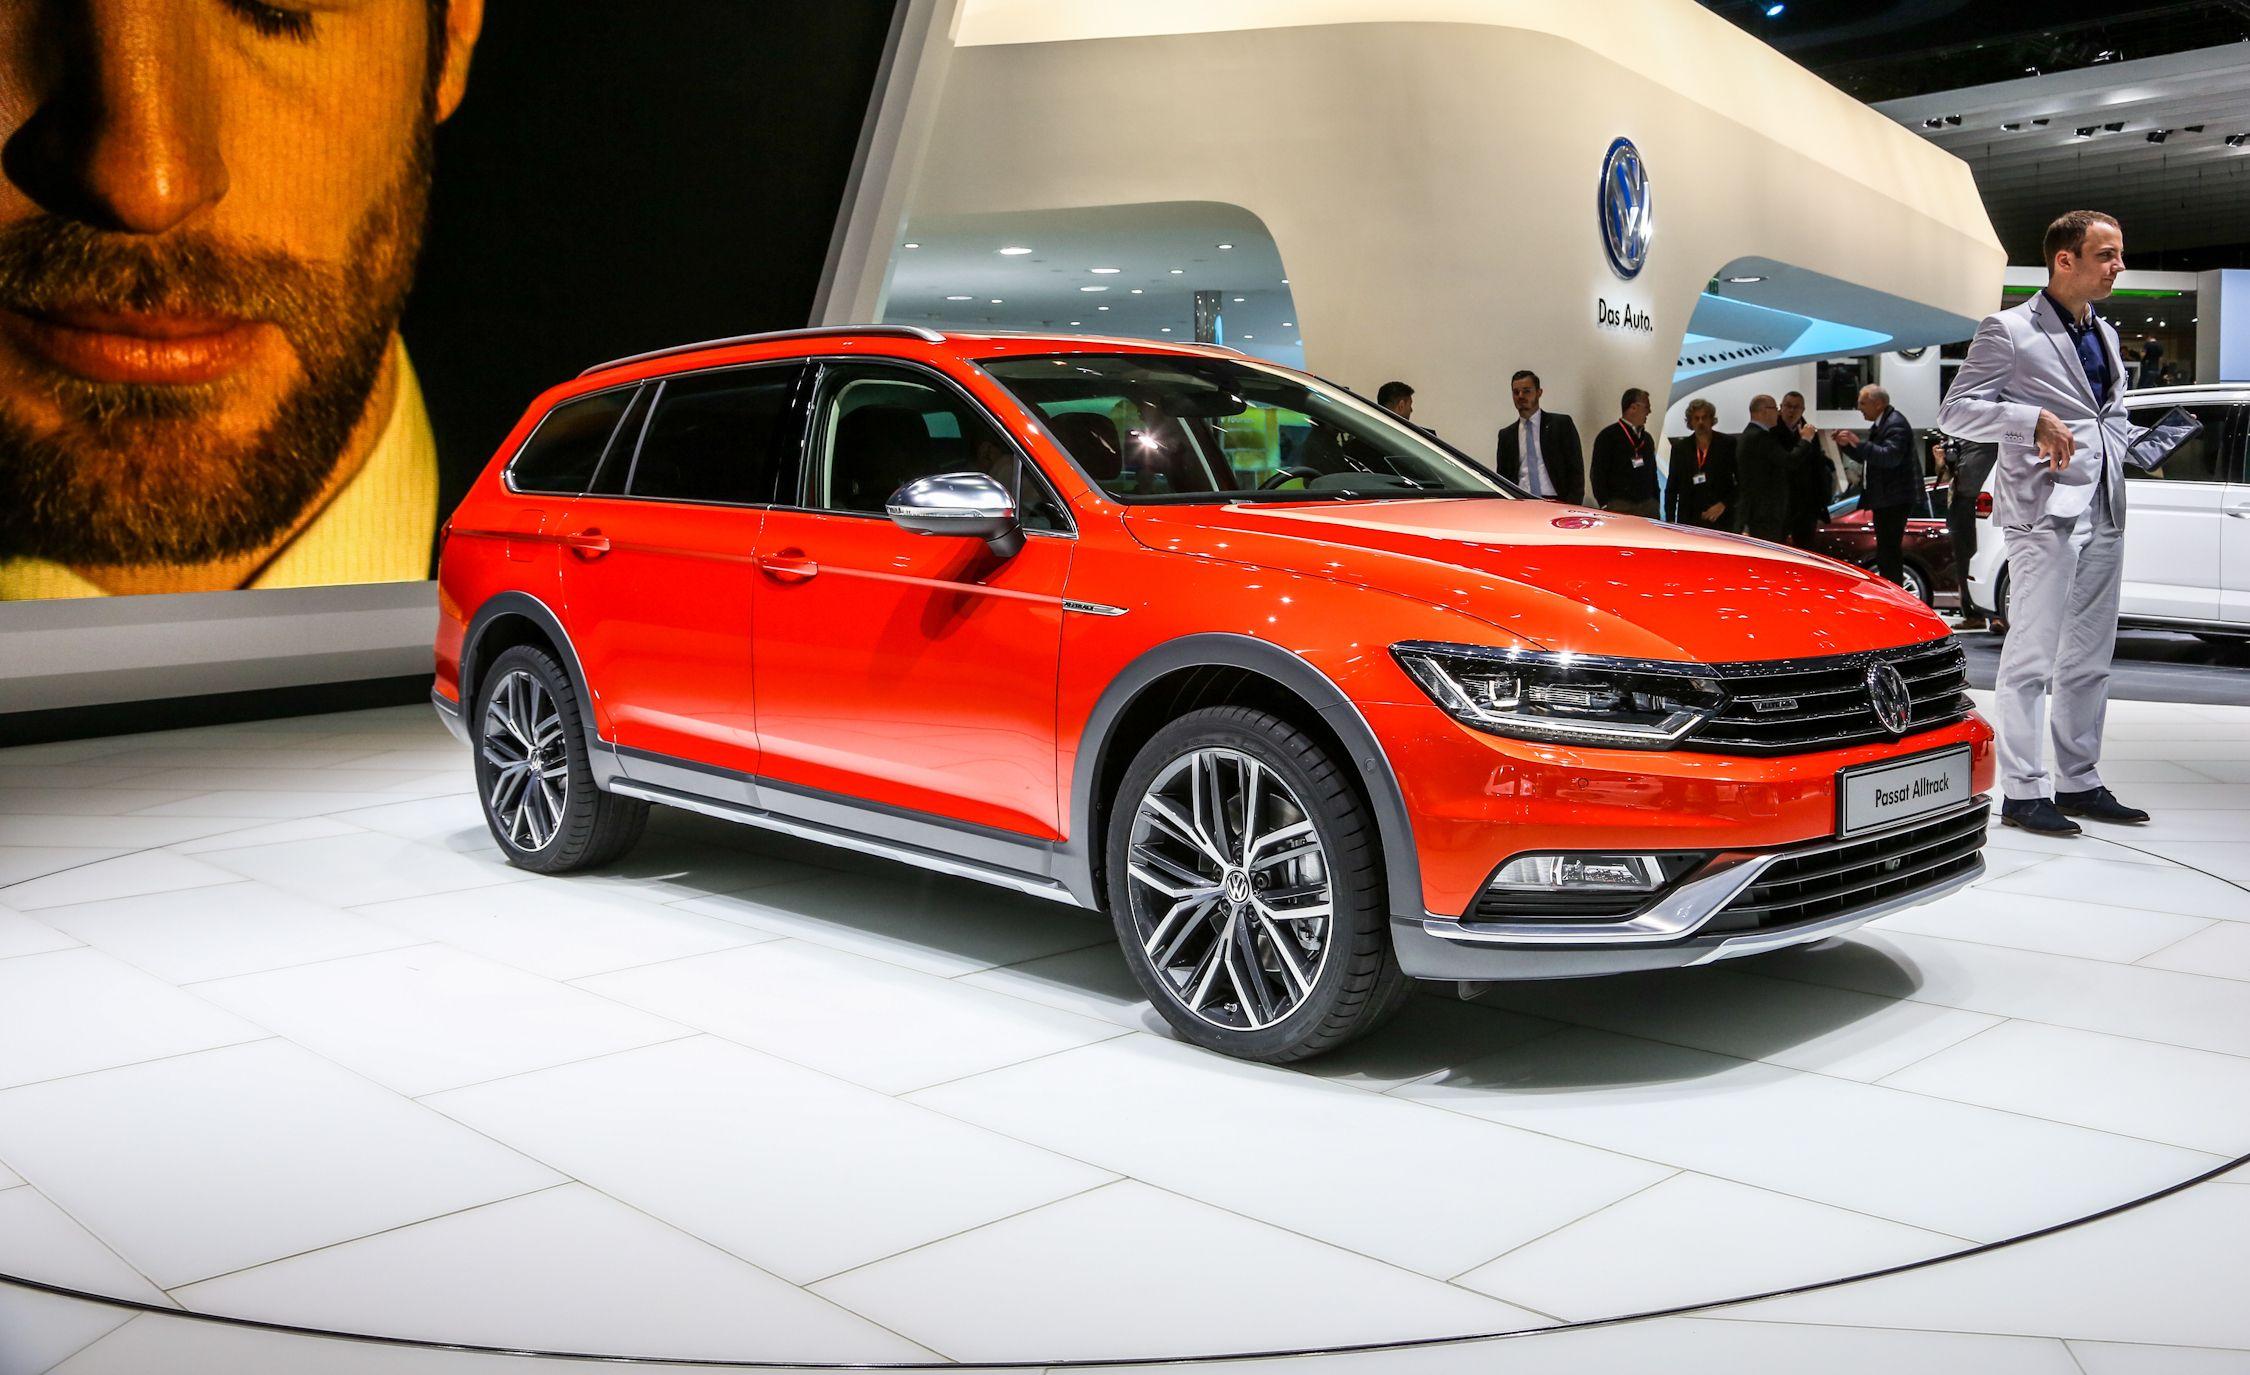 2016 Volkswagen Passat Alltrack wagon Euro spec 1011 passat alltrack usa 2018 2019 car release and reviews  at webbmarketing.co